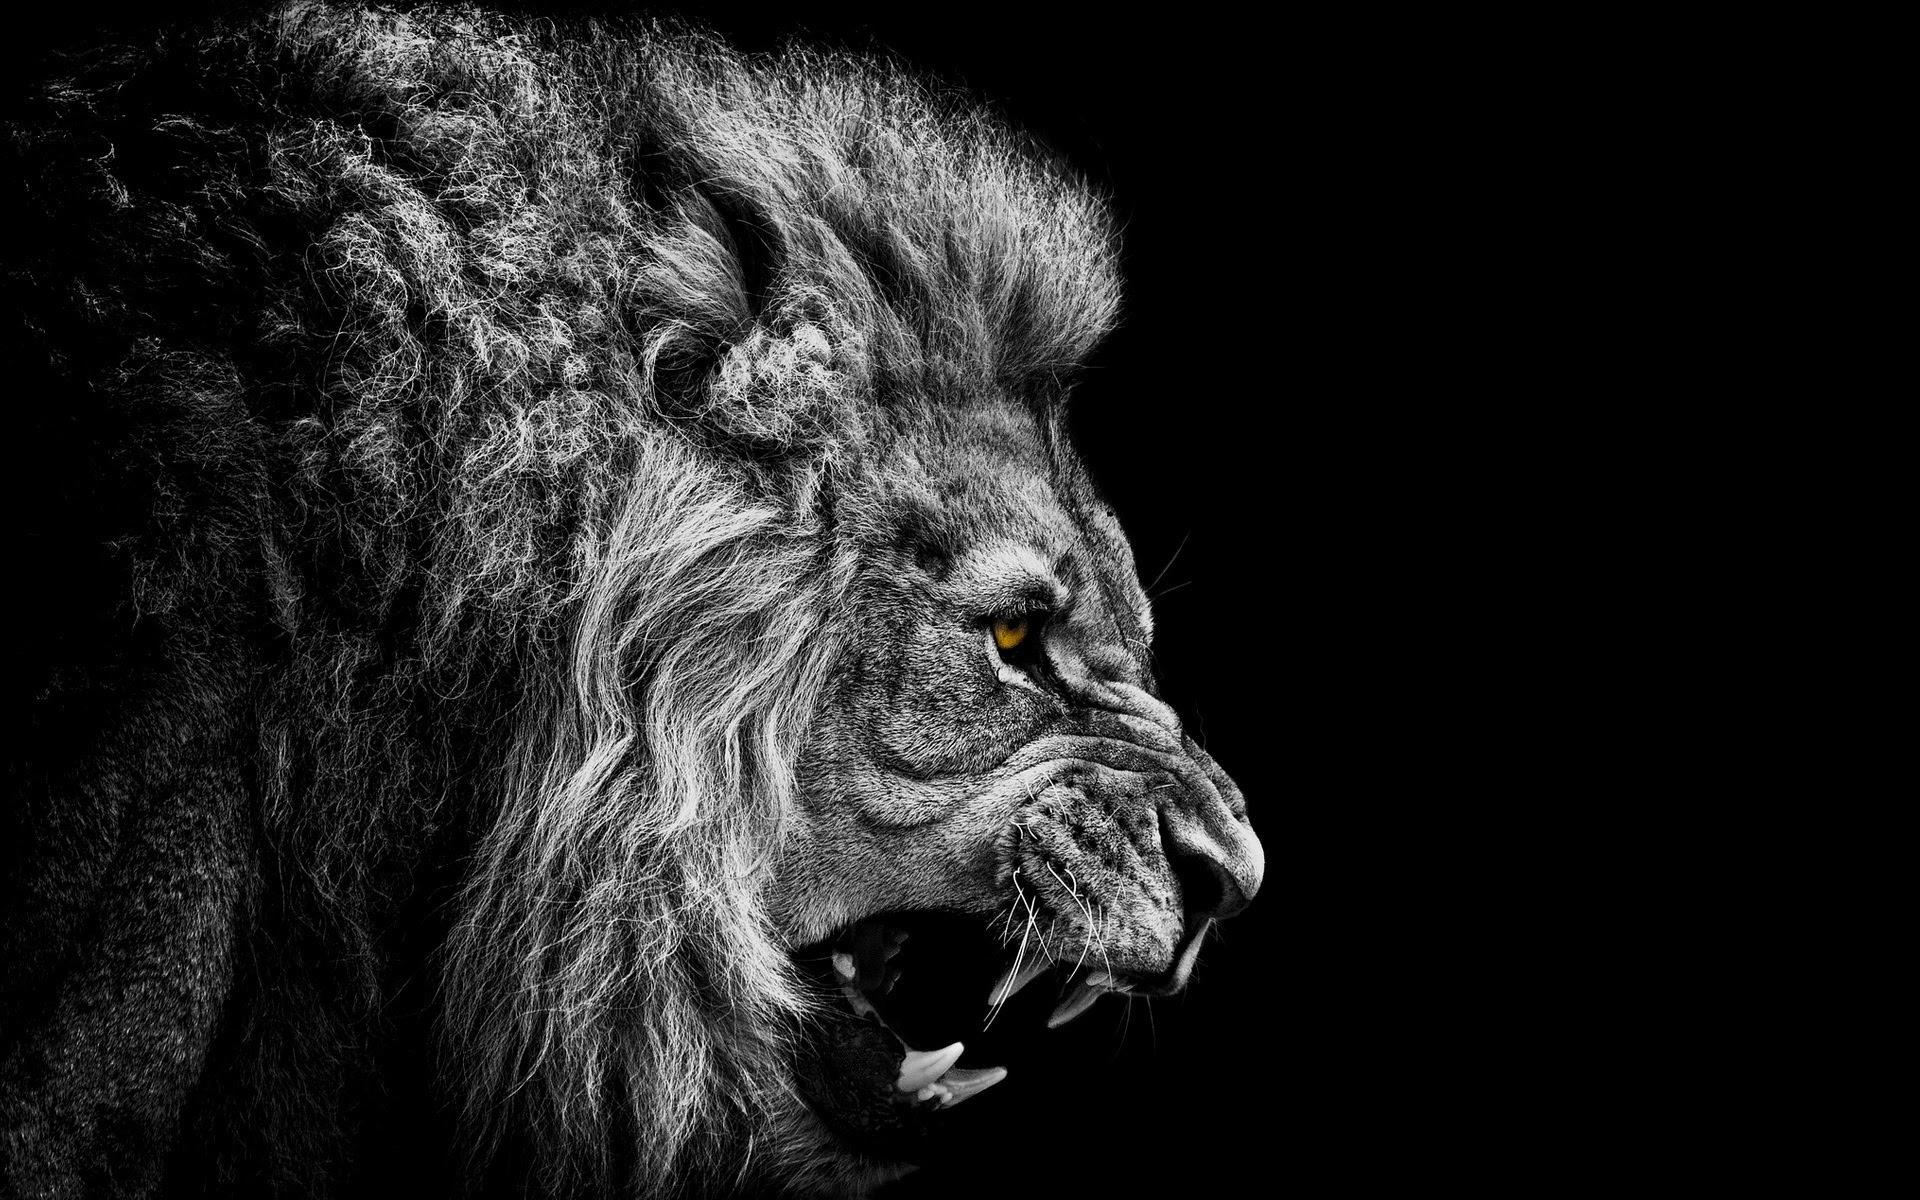 lionroarbw